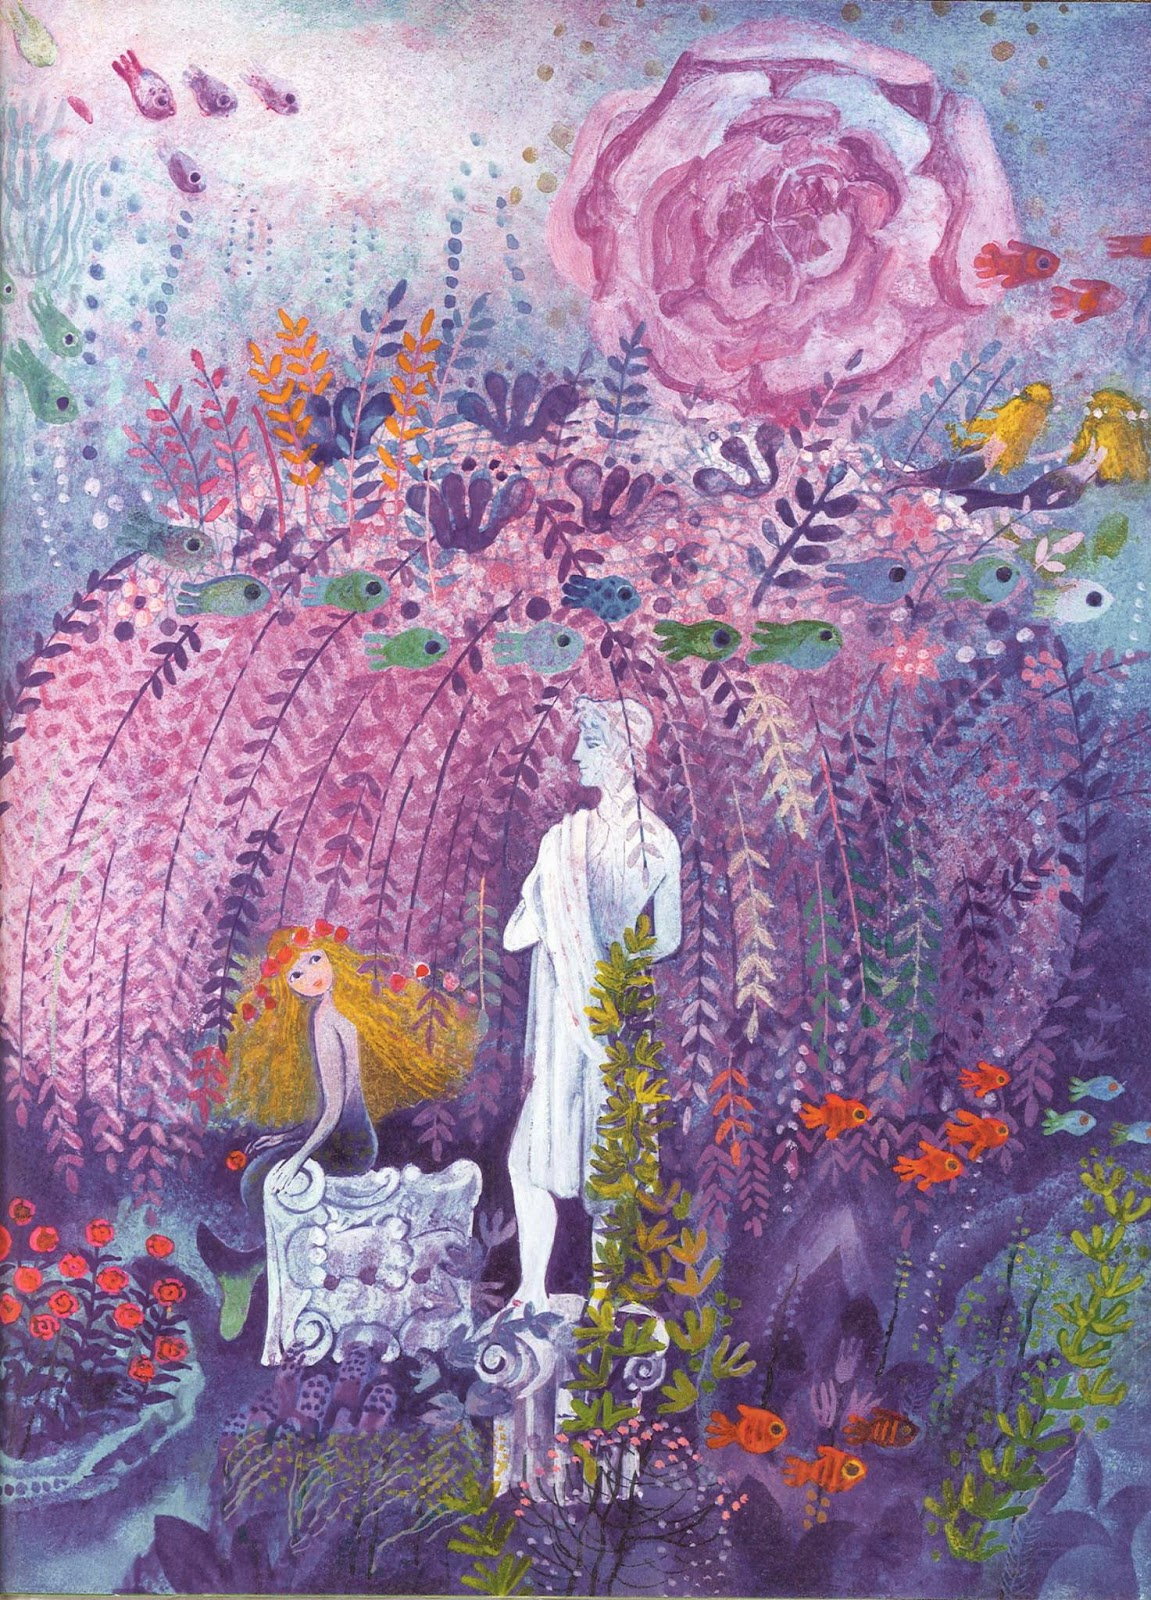 josef palecek, illustration